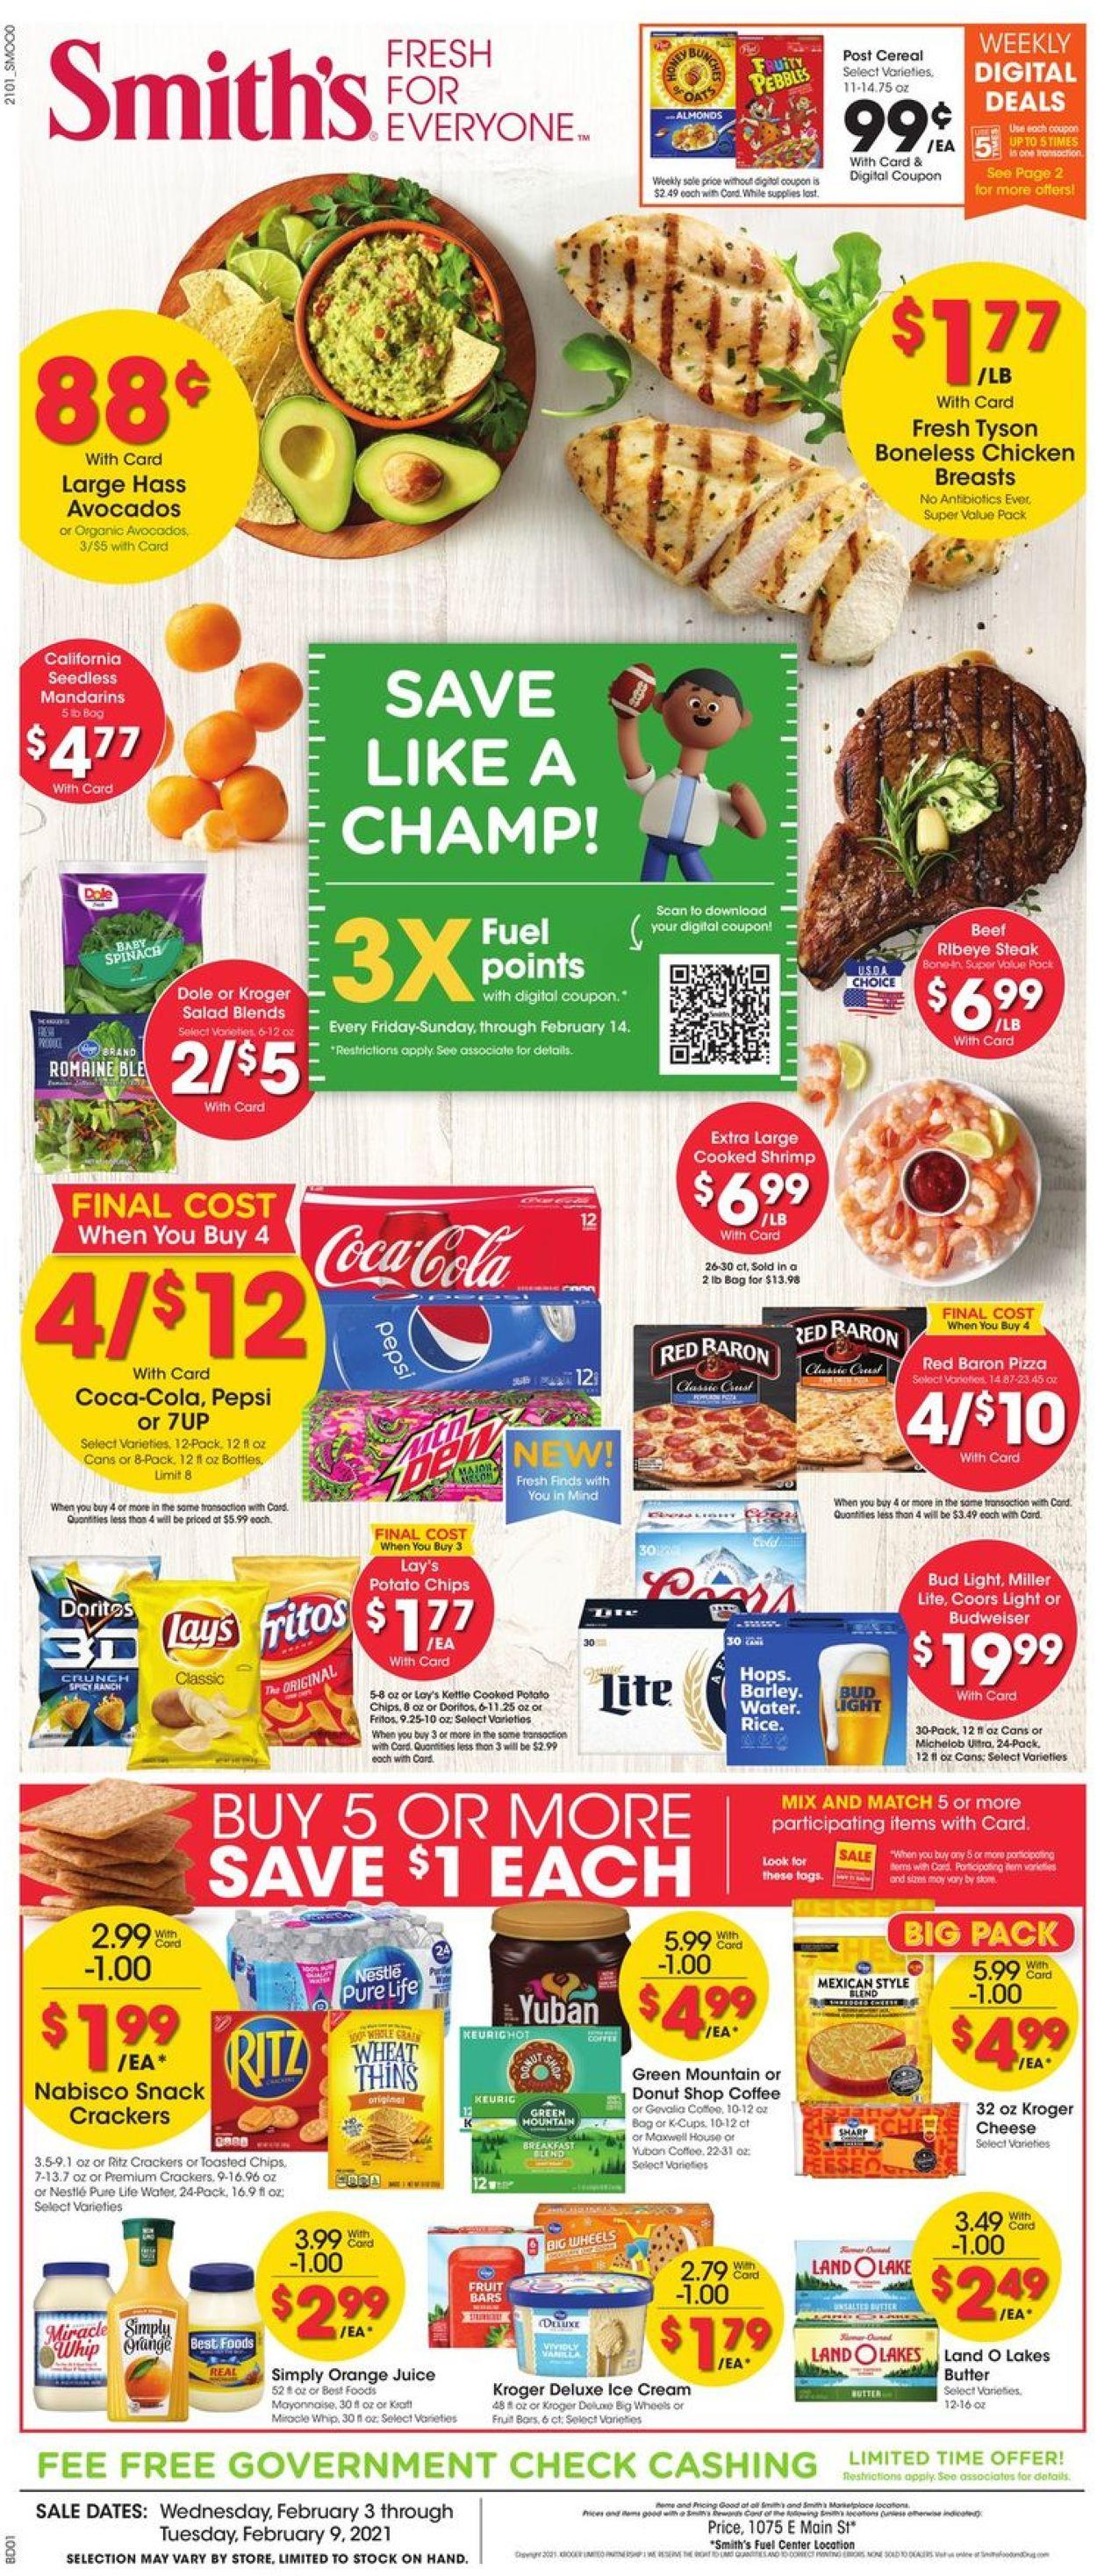 Smith's Weekly Ad Circular - valid 02/03-02/09/2021